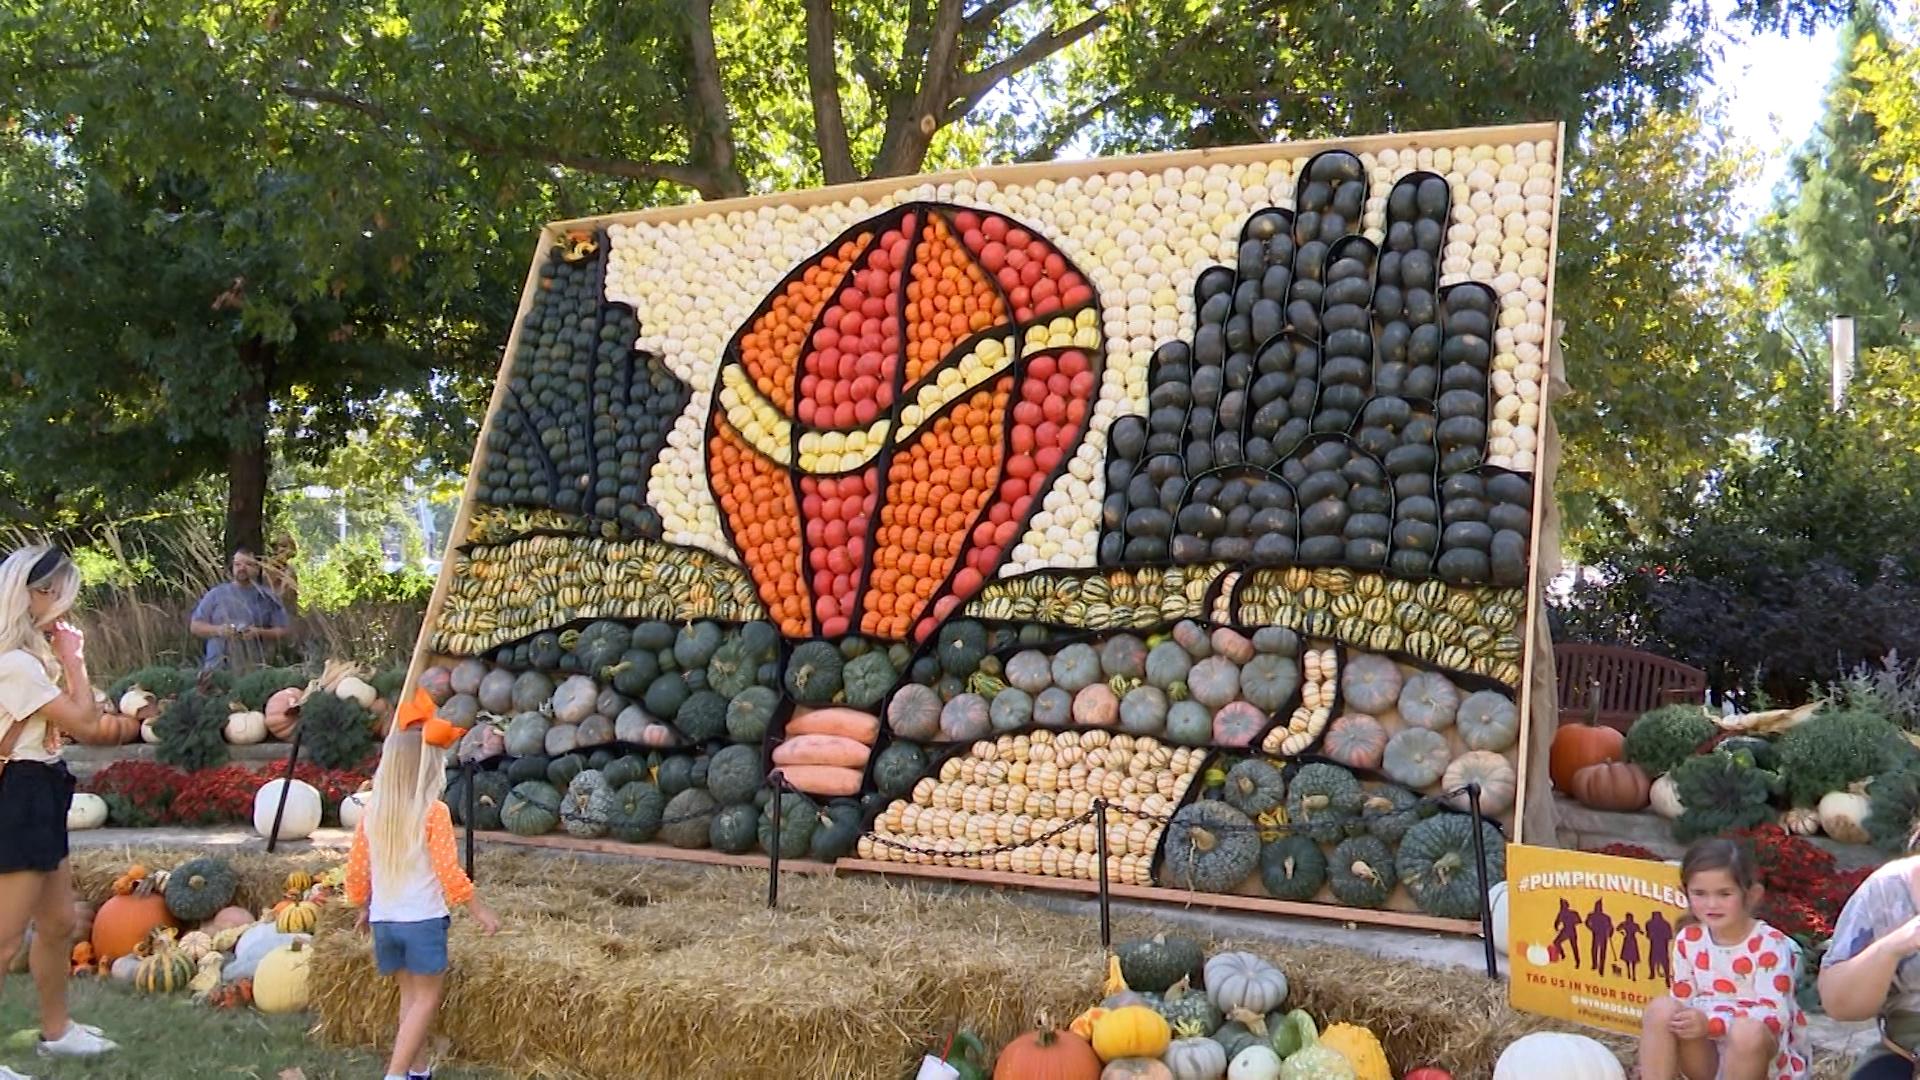 Mural made of pumpkins at Pumpkinville 2021